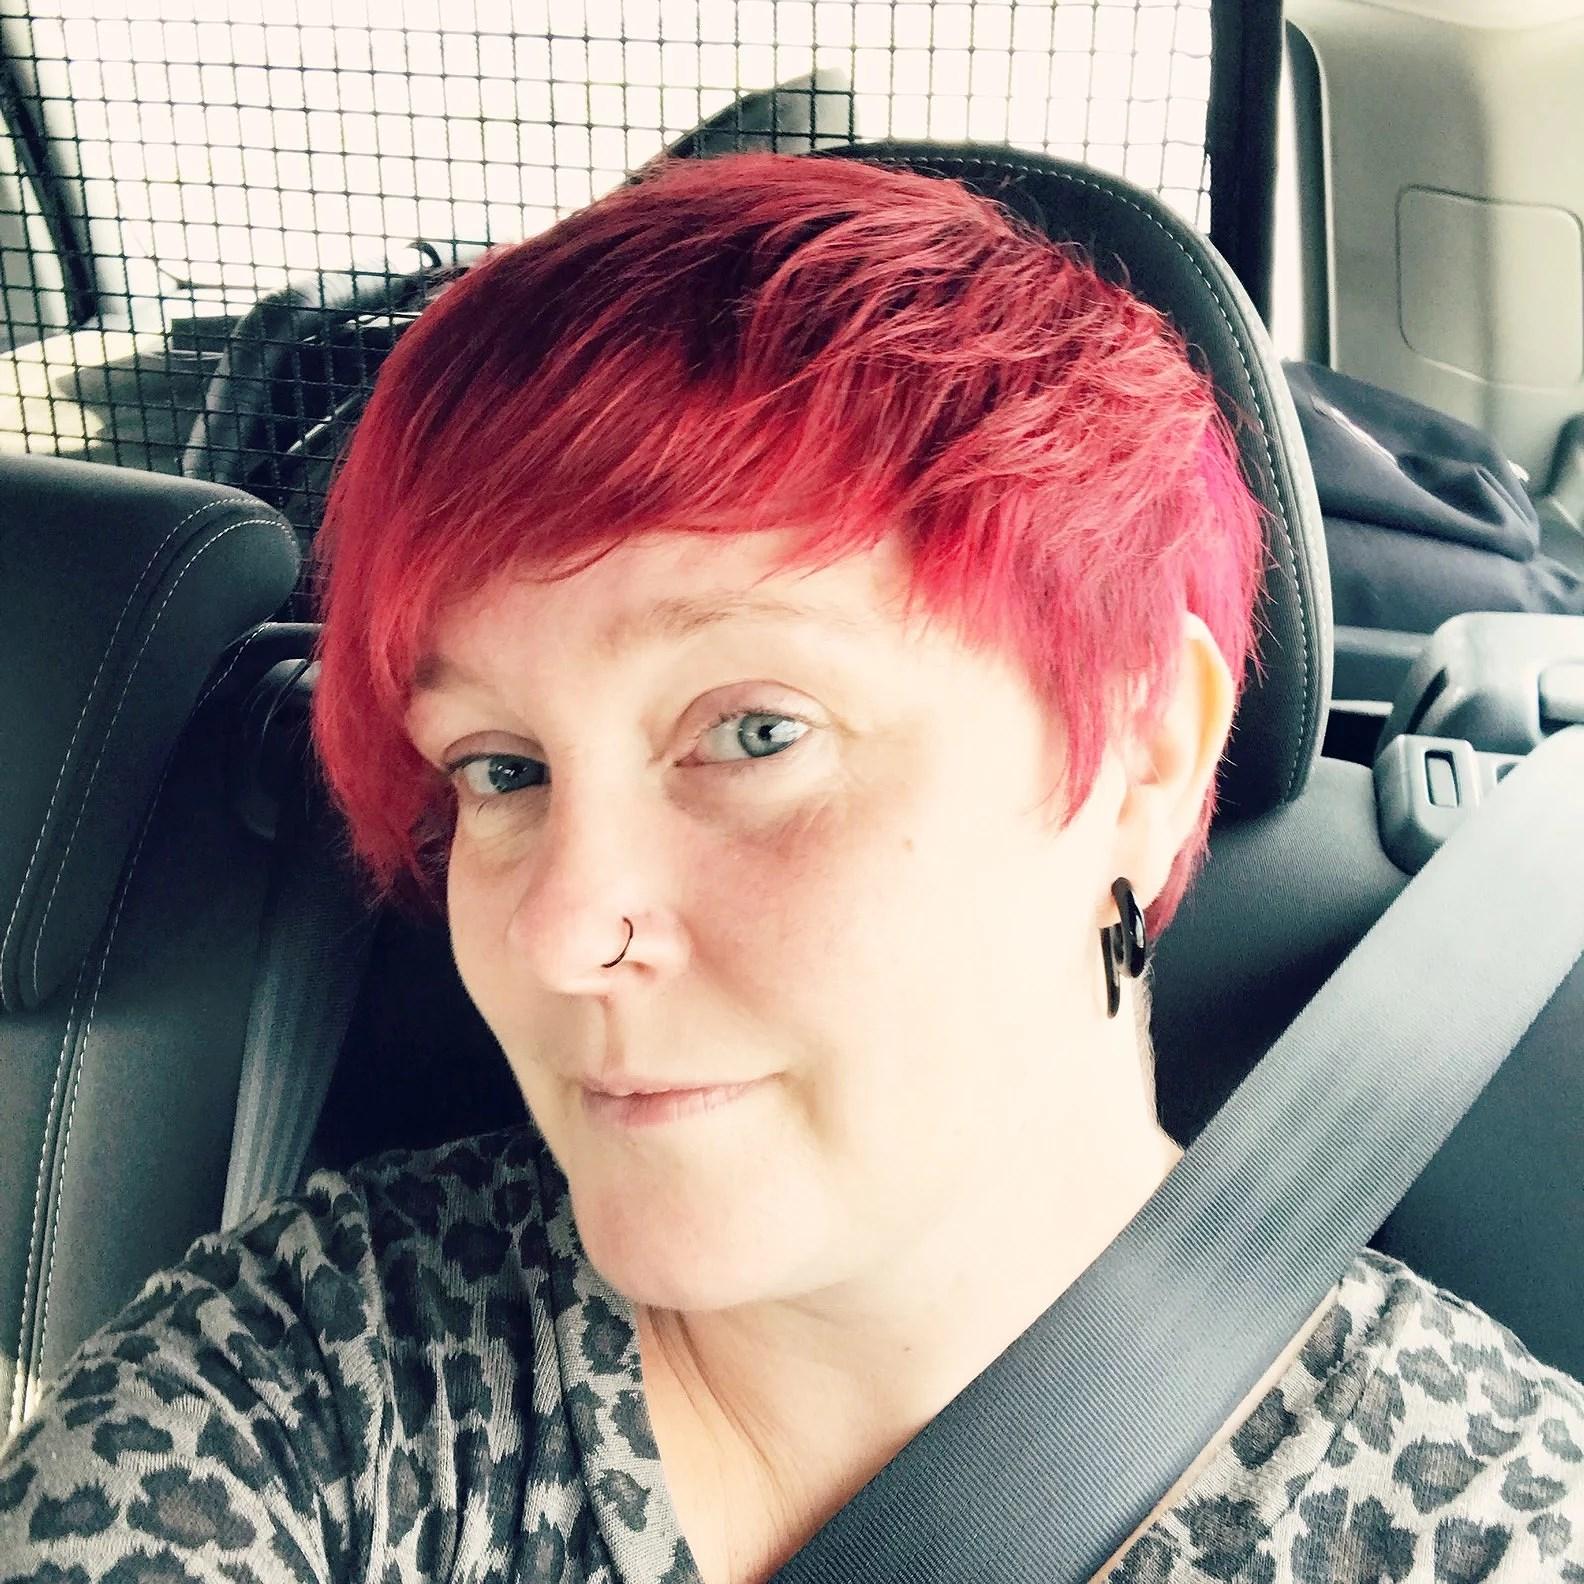 Ny hårfärg!